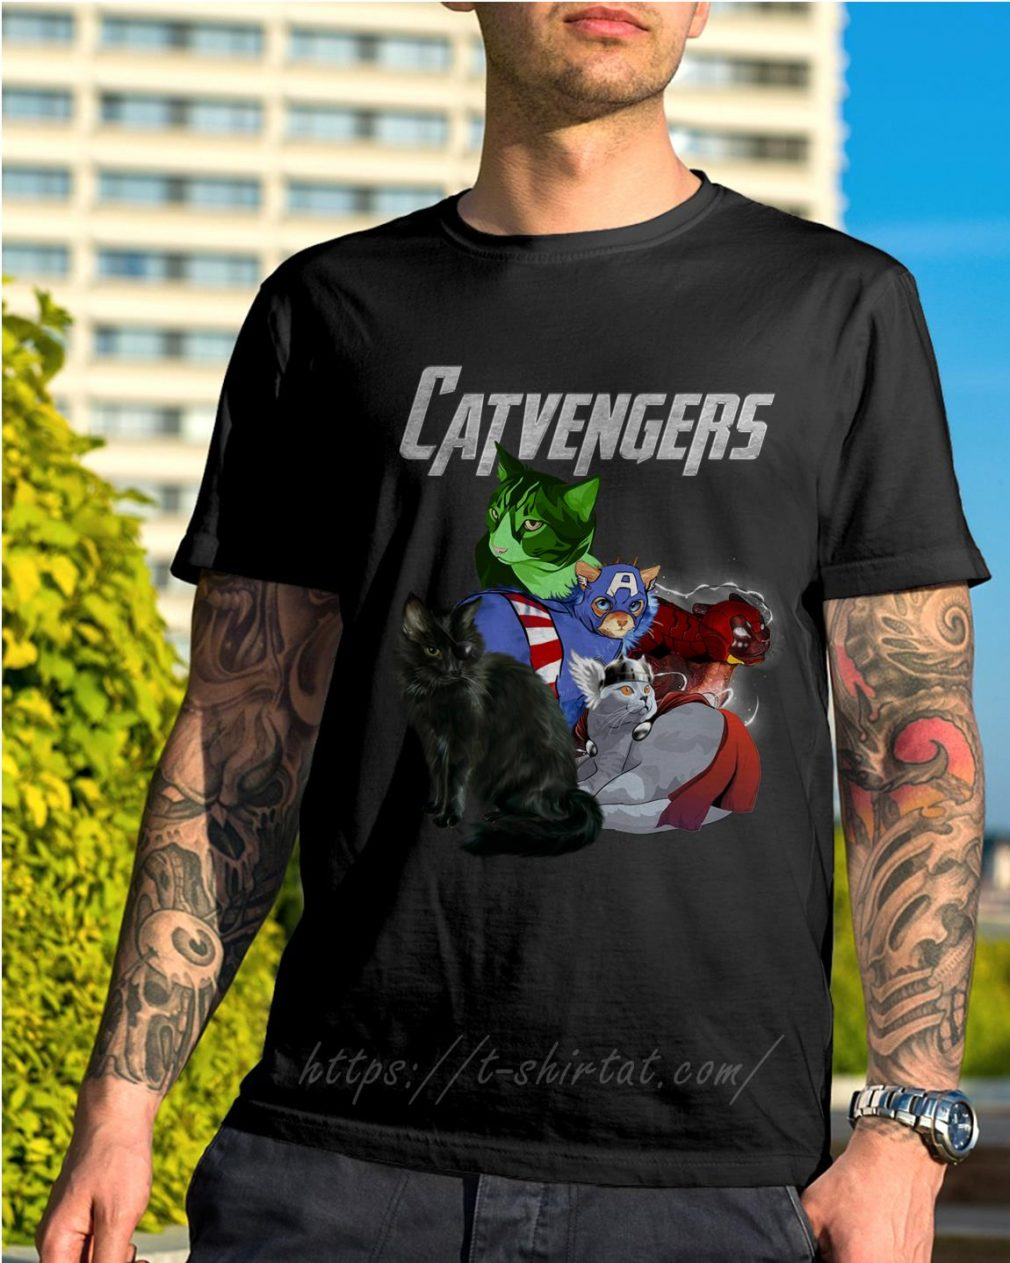 Catvengers shirt